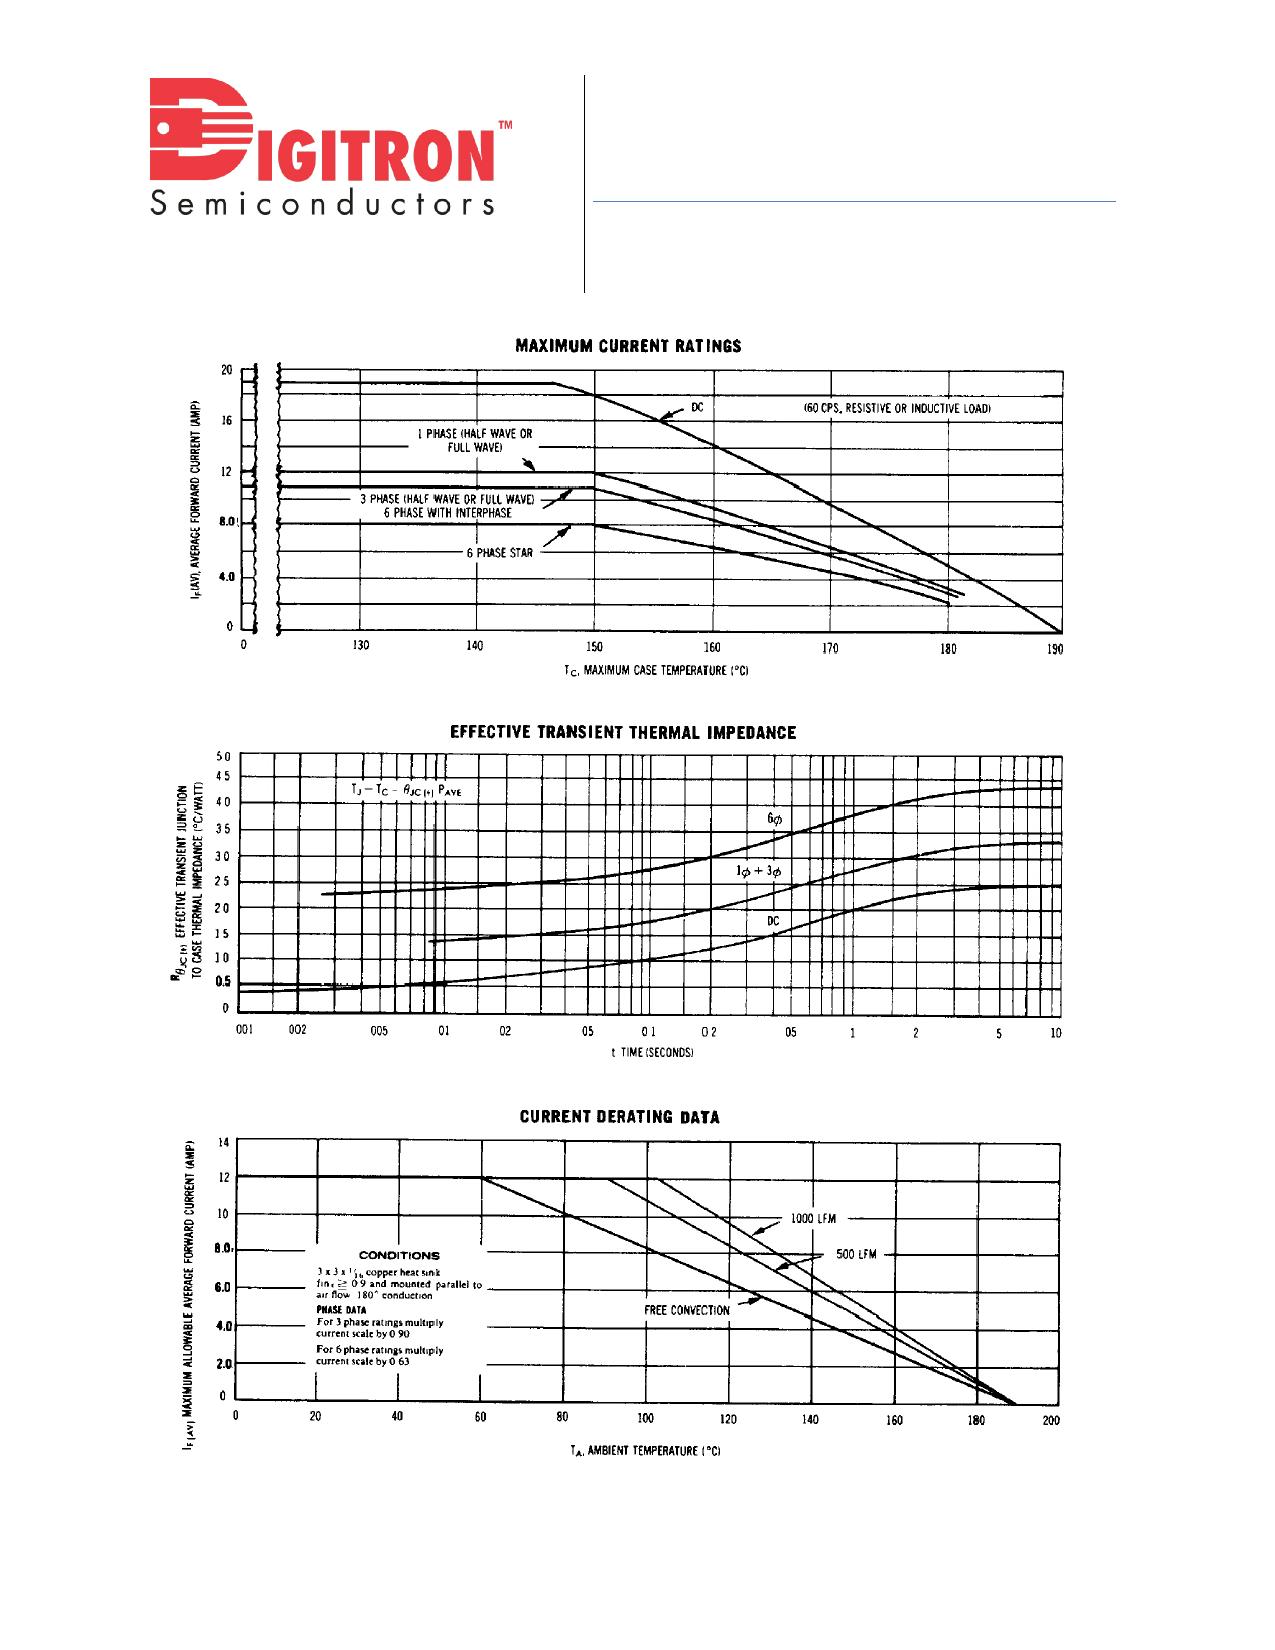 MR1126 pdf, 반도체, 판매, 대치품